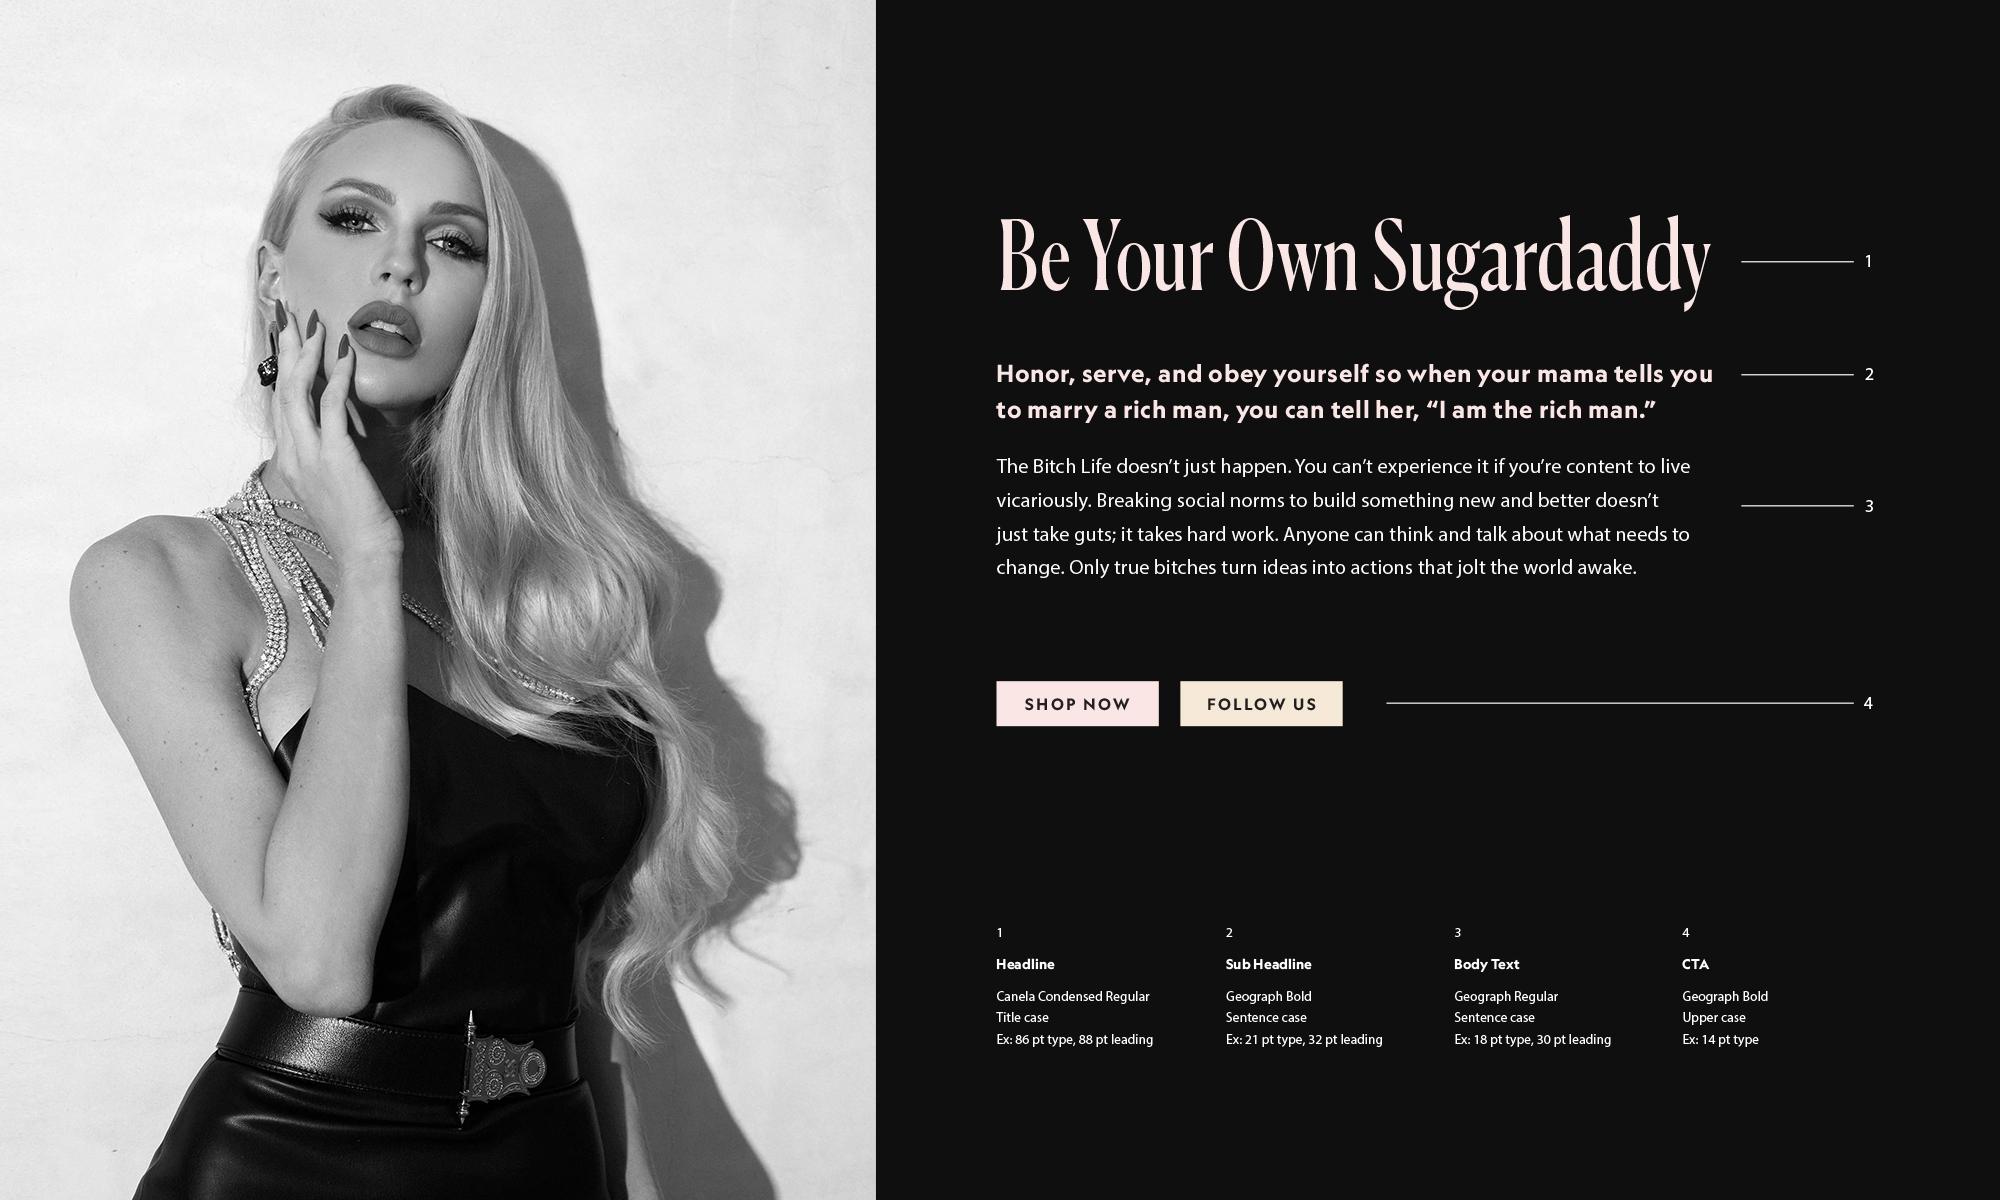 branding agency for celebrities